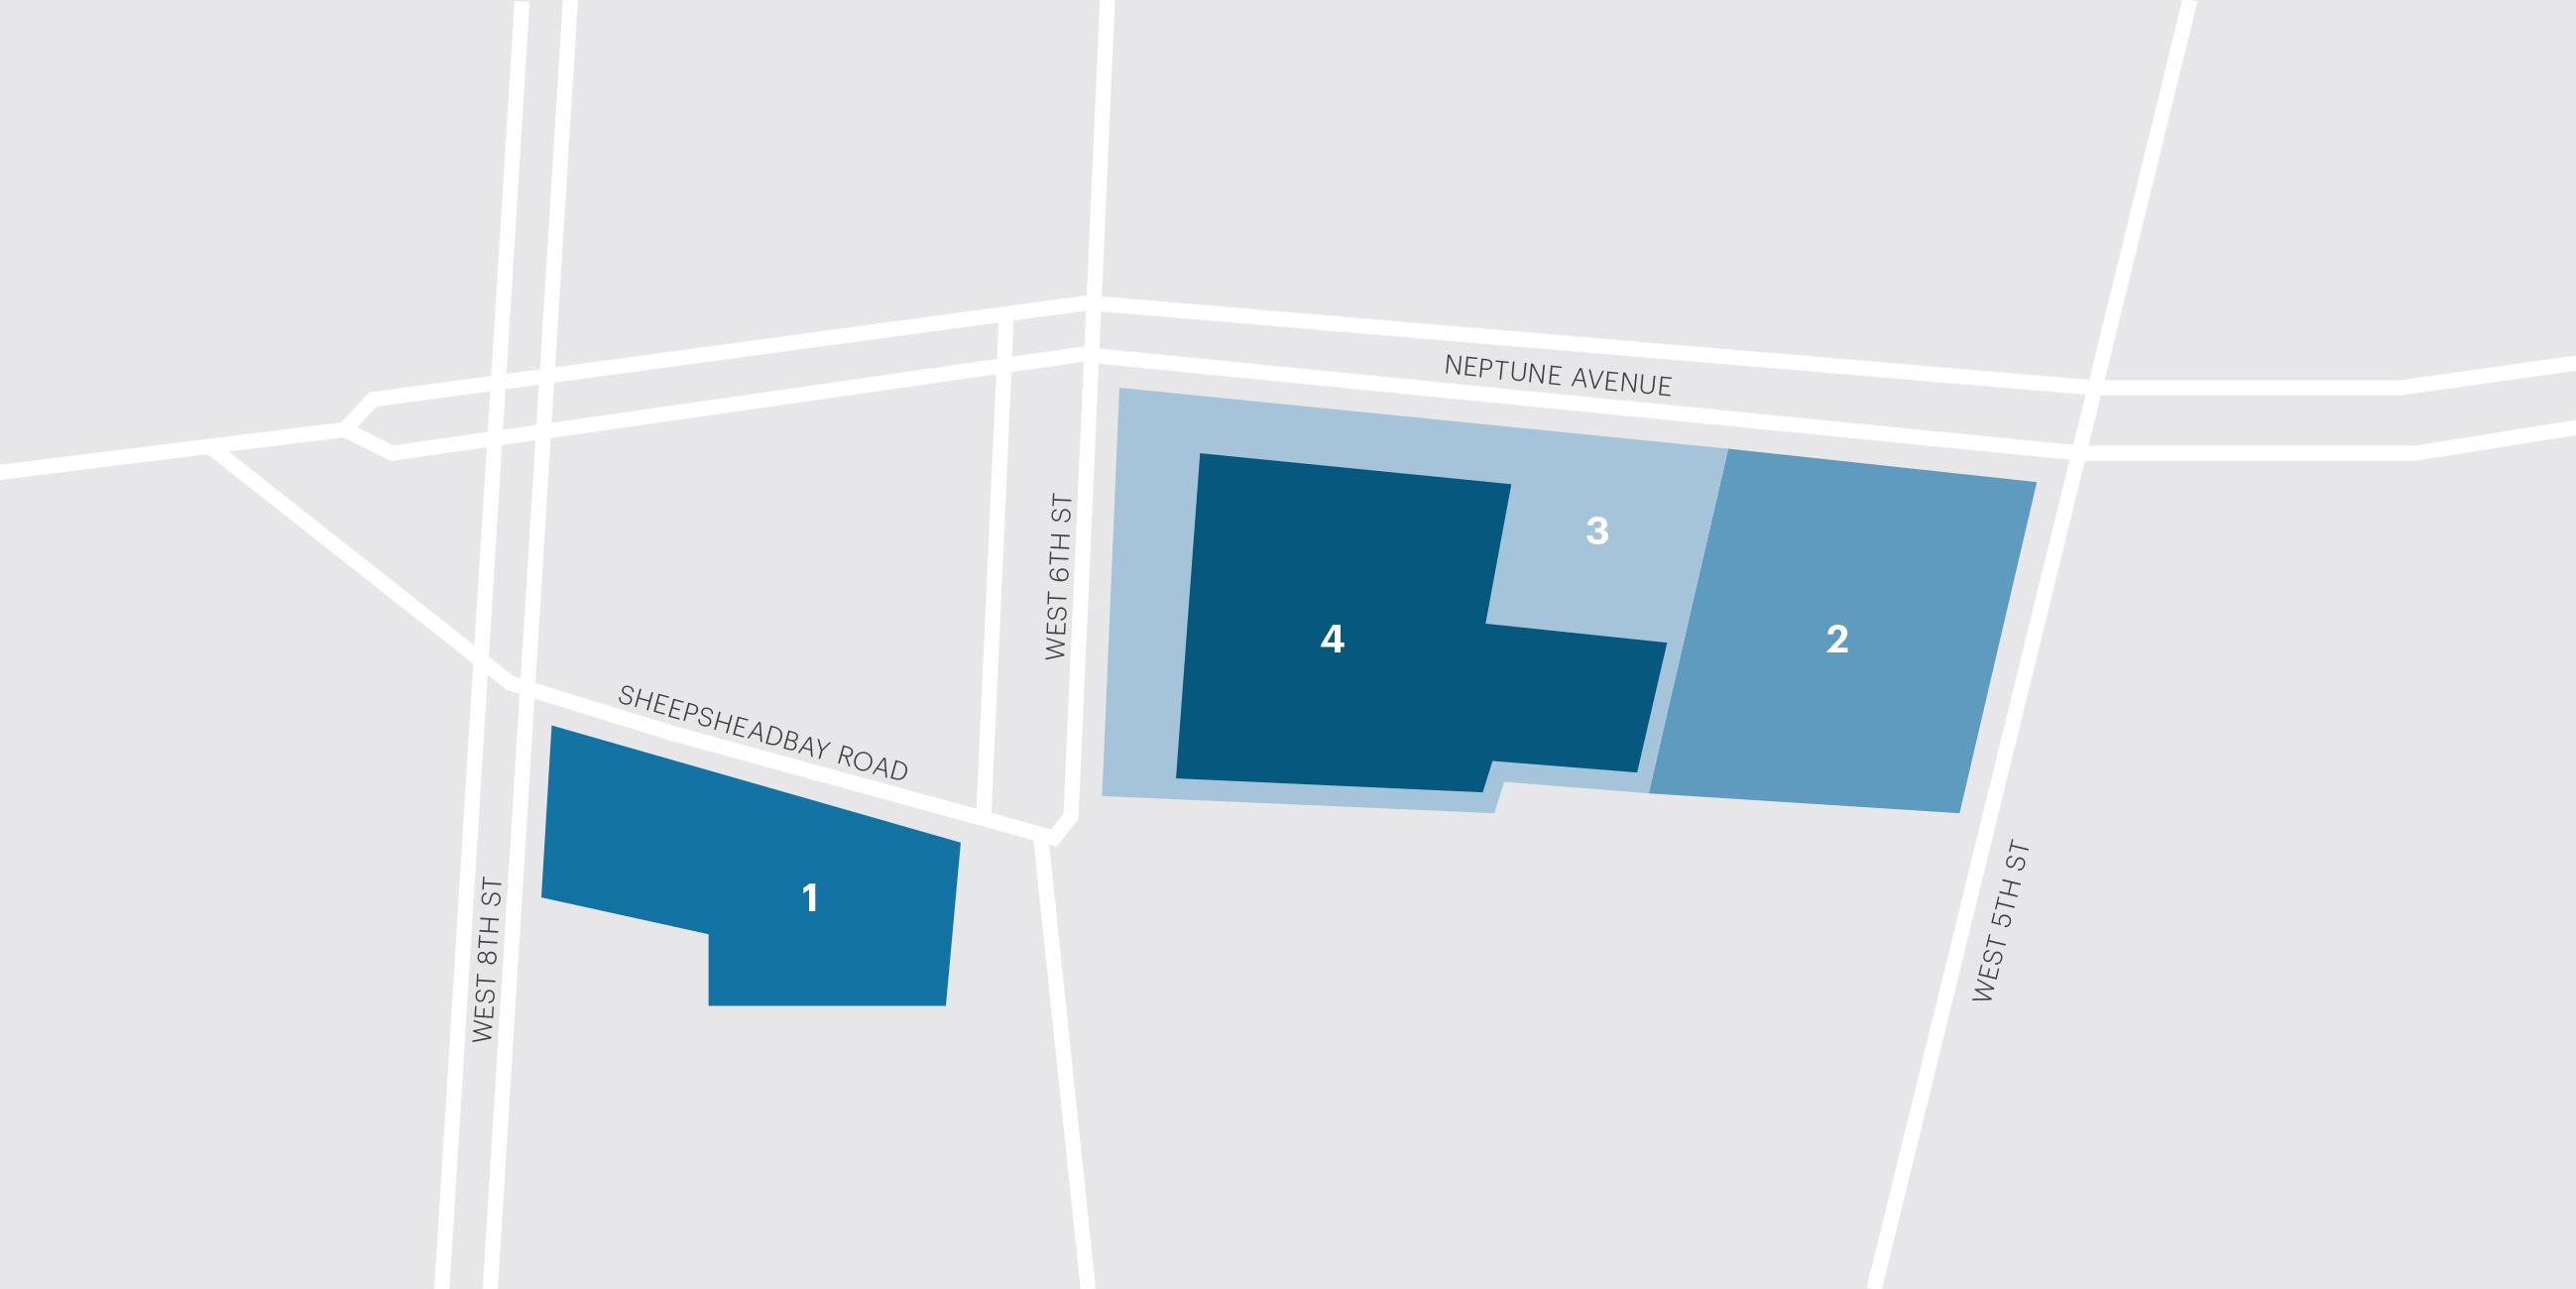 Neptune/Sixth Map via Cammeby's